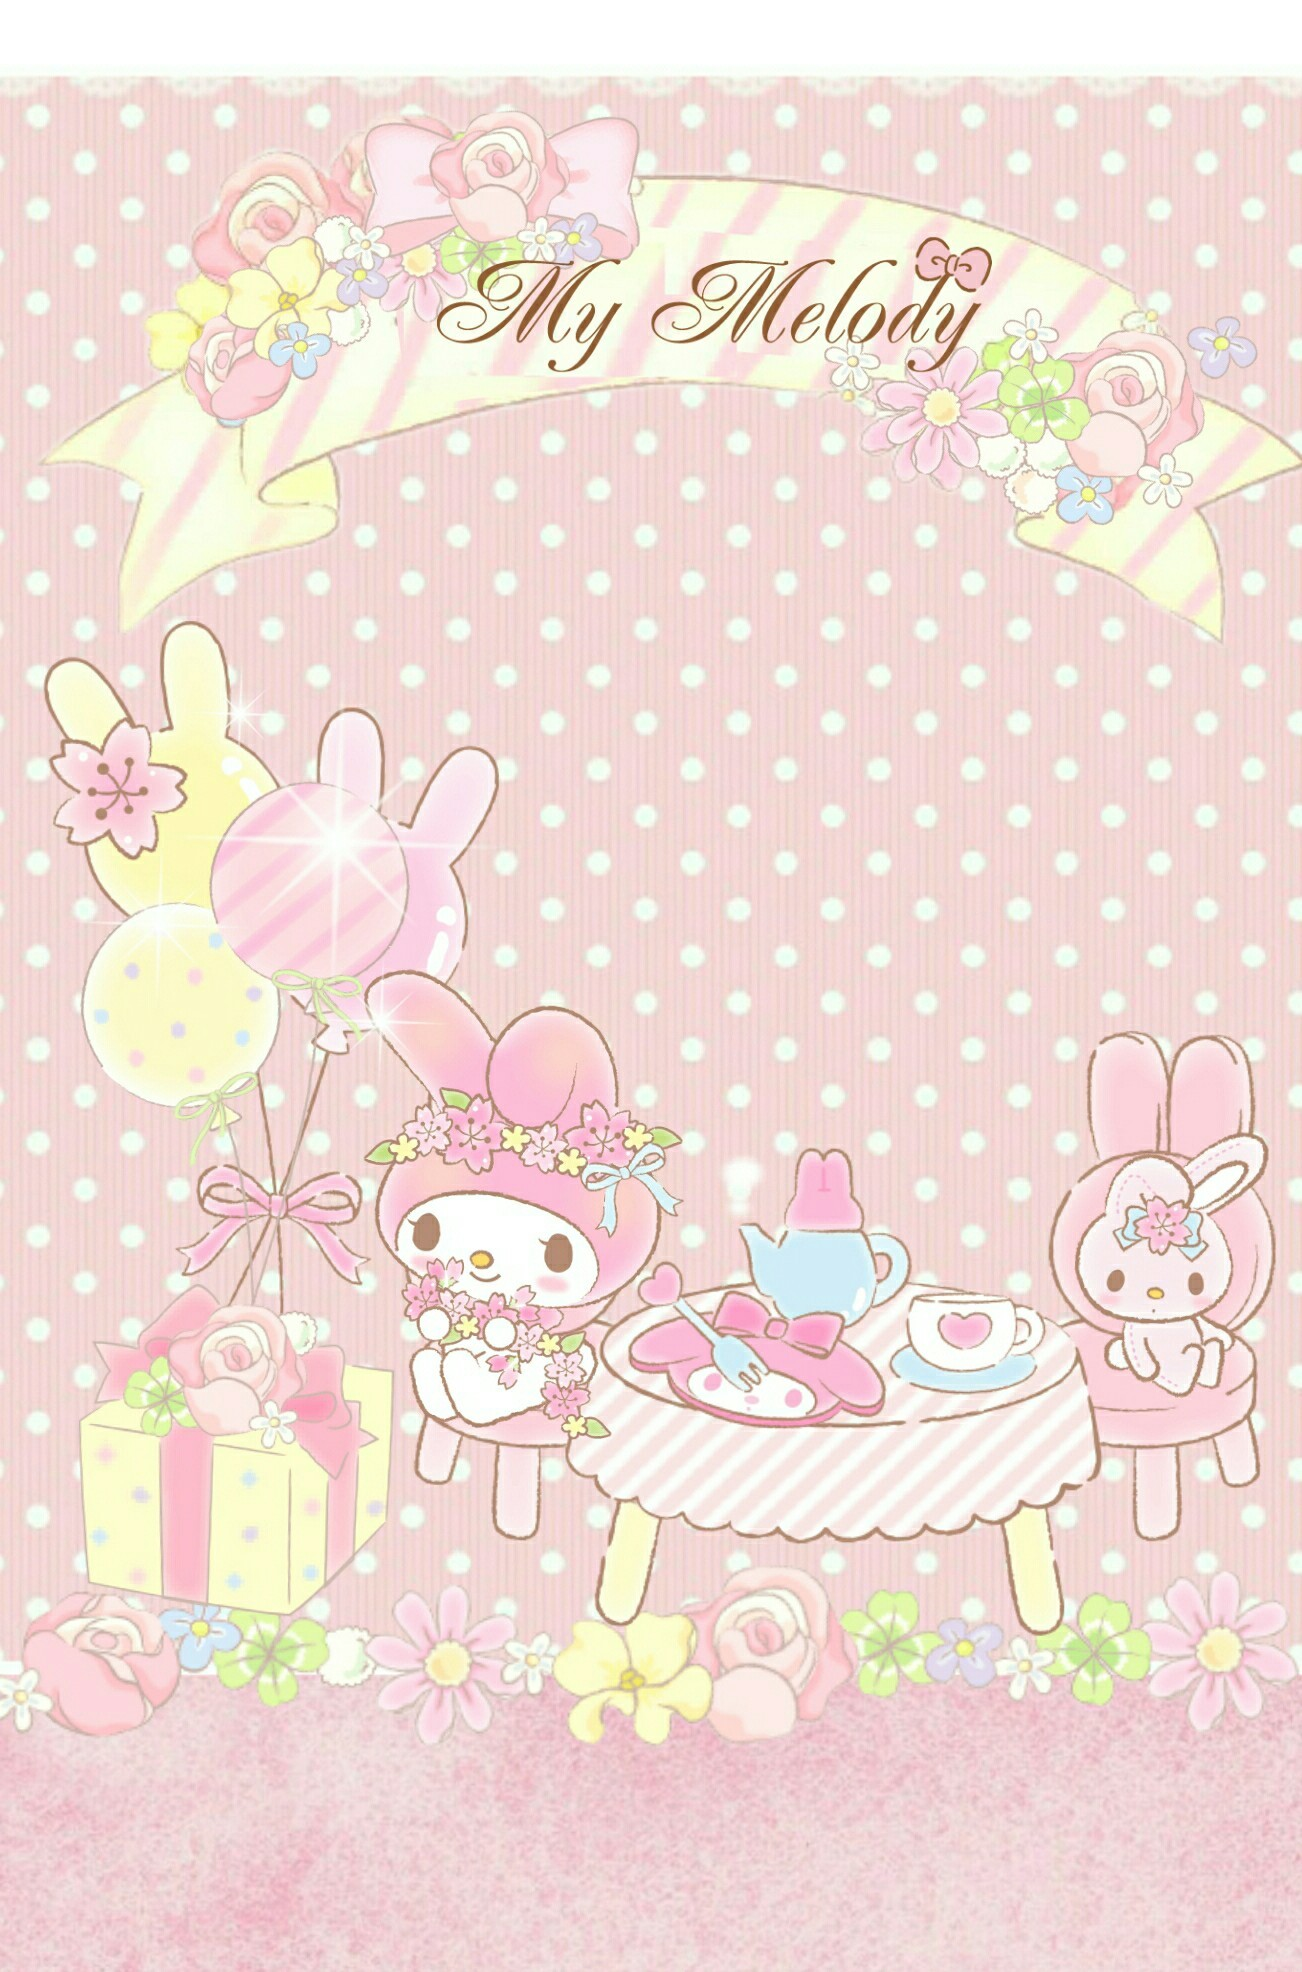 Cute Koala Hd Wallpaper My Melody Wallpaper 183 ① Wallpapertag